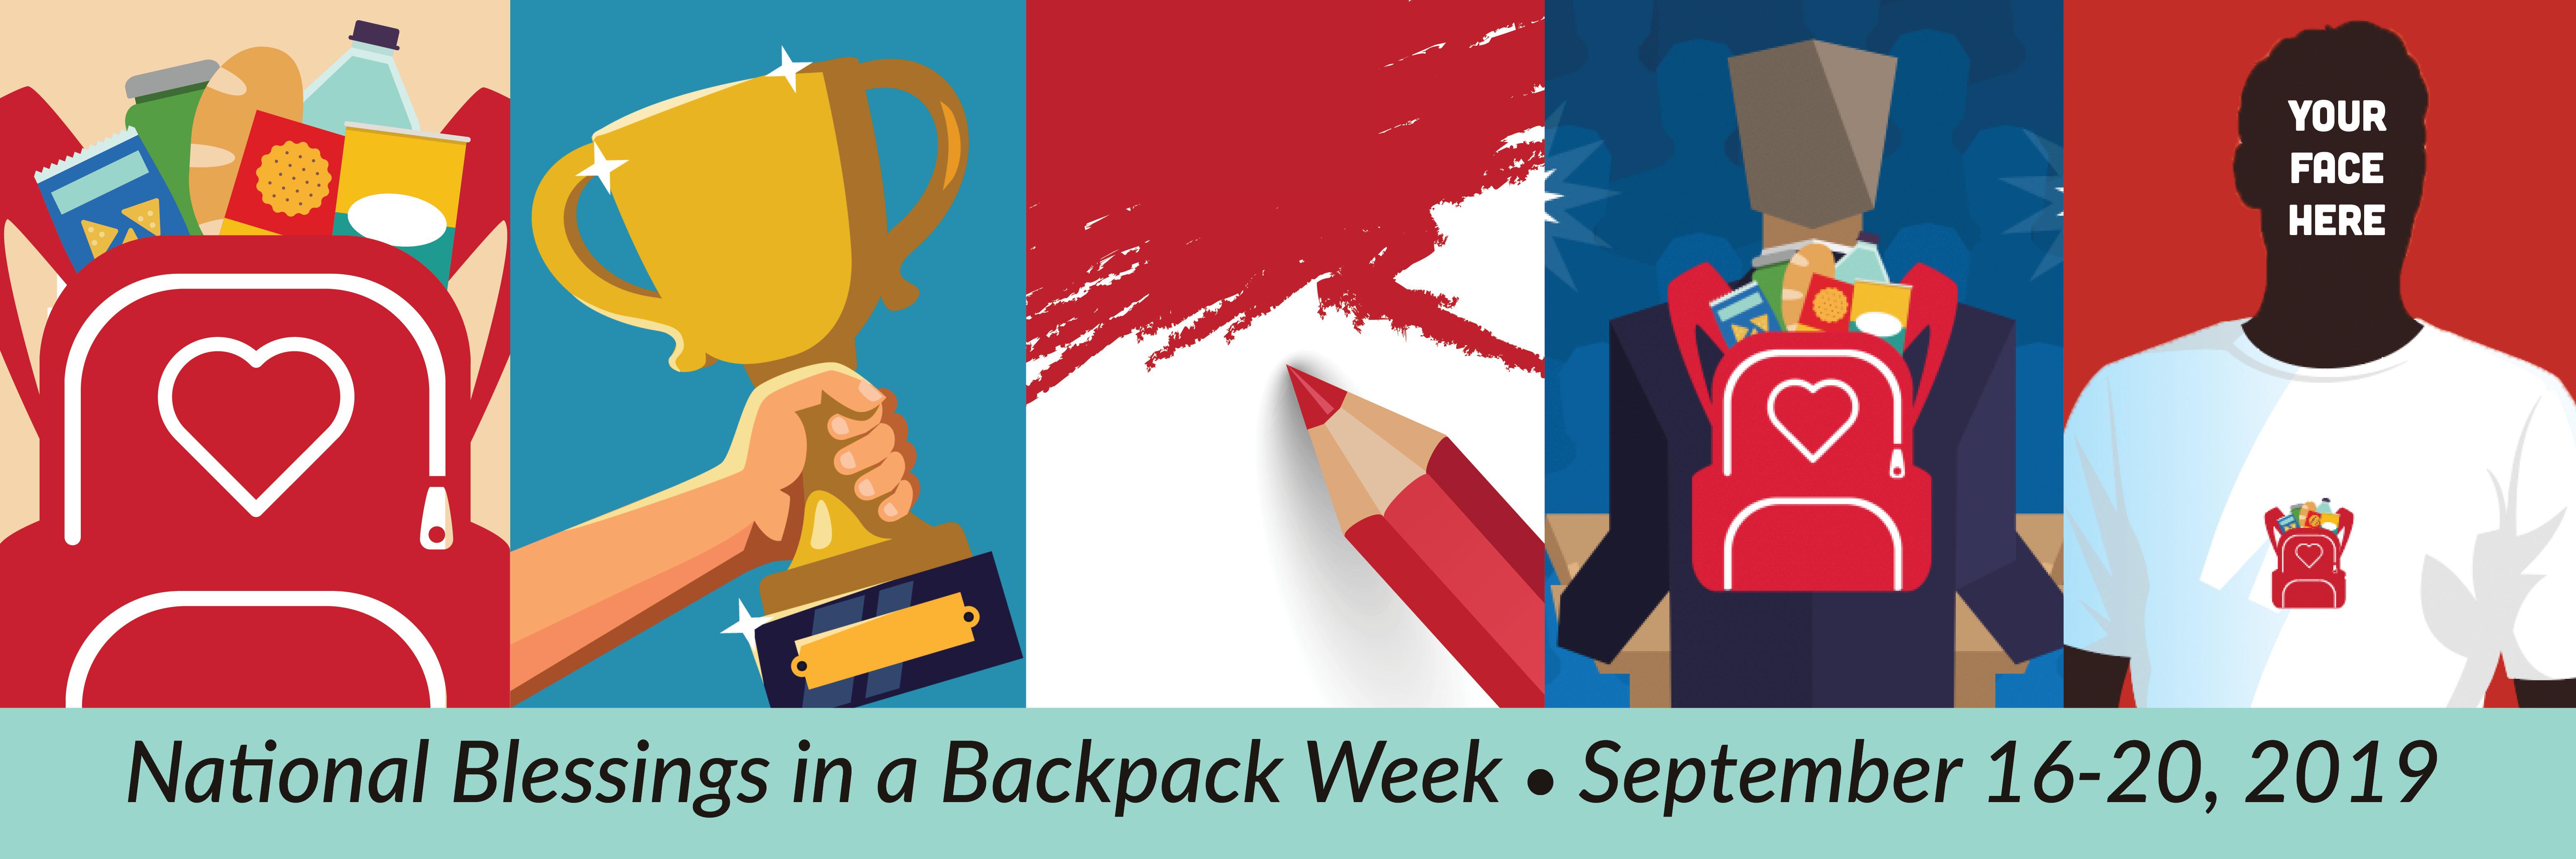 National Blessings in a Backpack Week